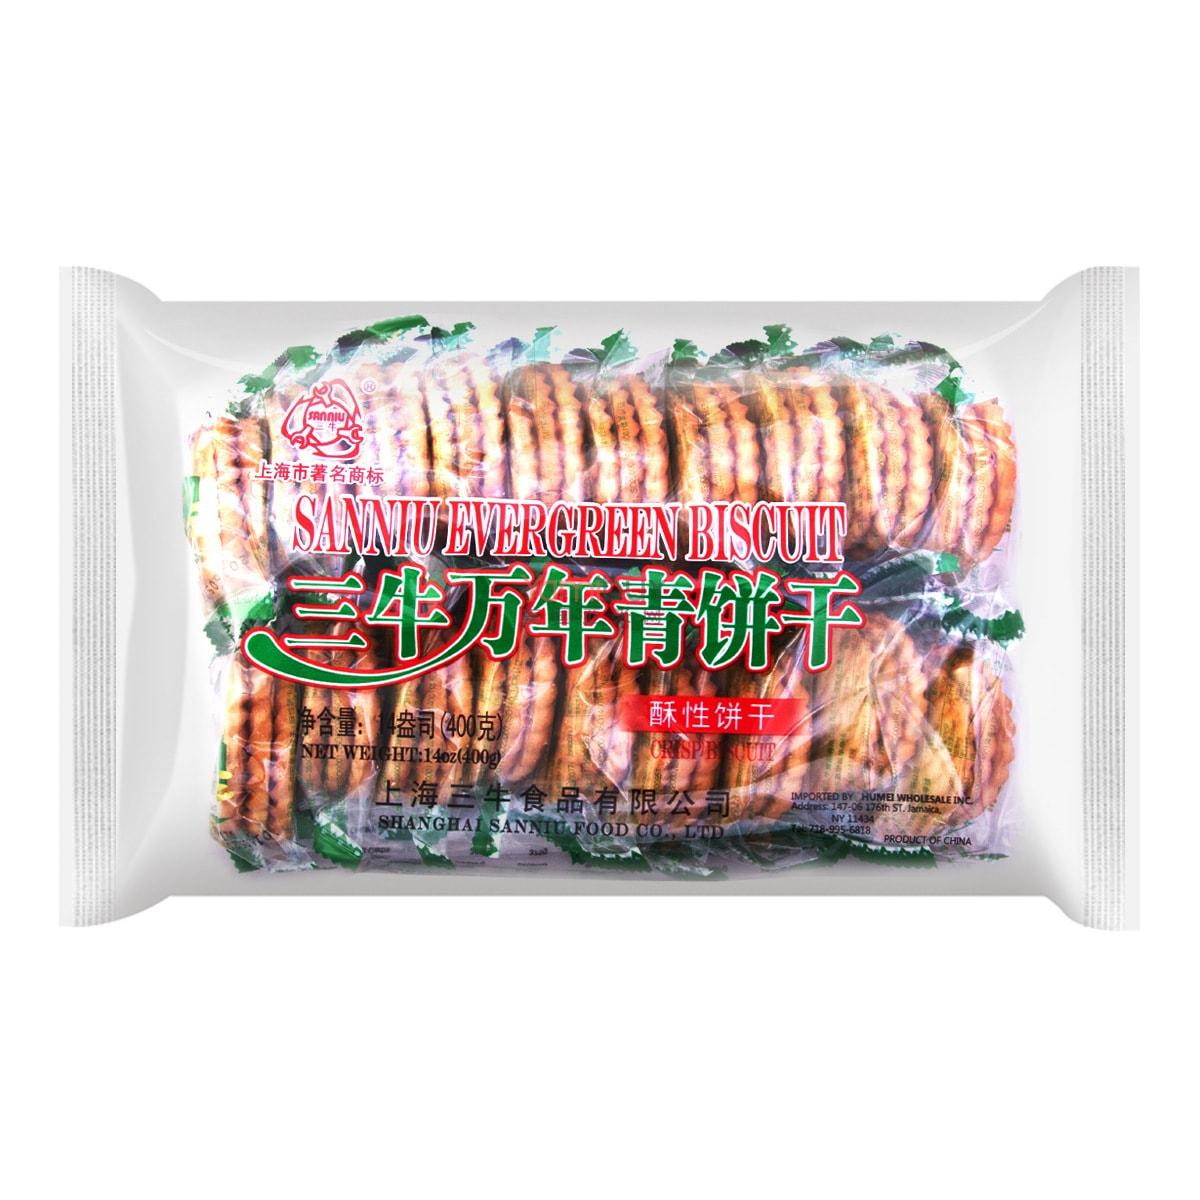 SanNiu Evergreen Biscuit 400g